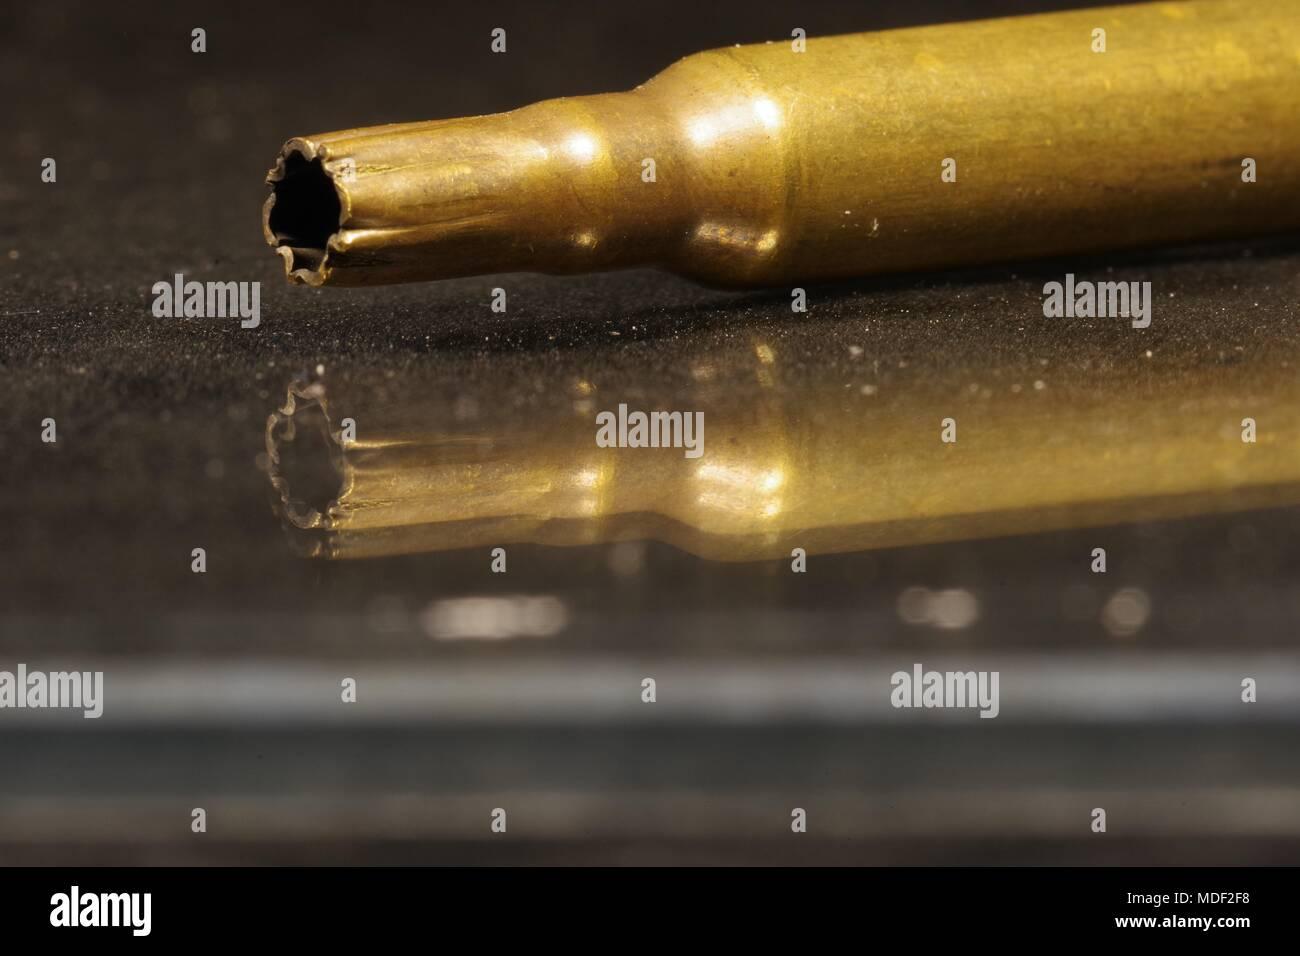 Verbrachte Messing Gewehr runden Gehäuse. Bullet Hautnah. UK. Stockbild